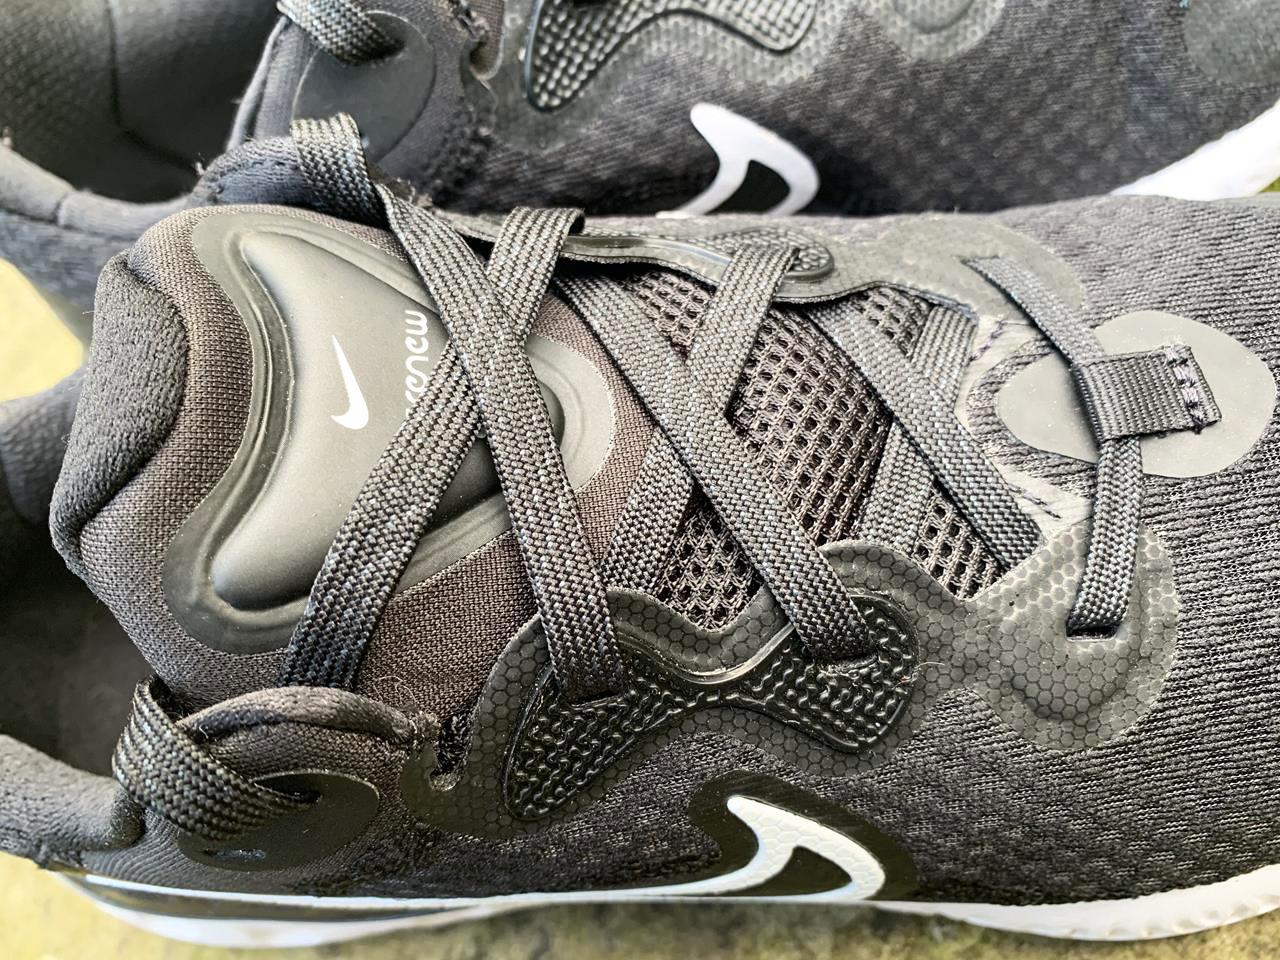 Nike Renew Run 2 - Closeup